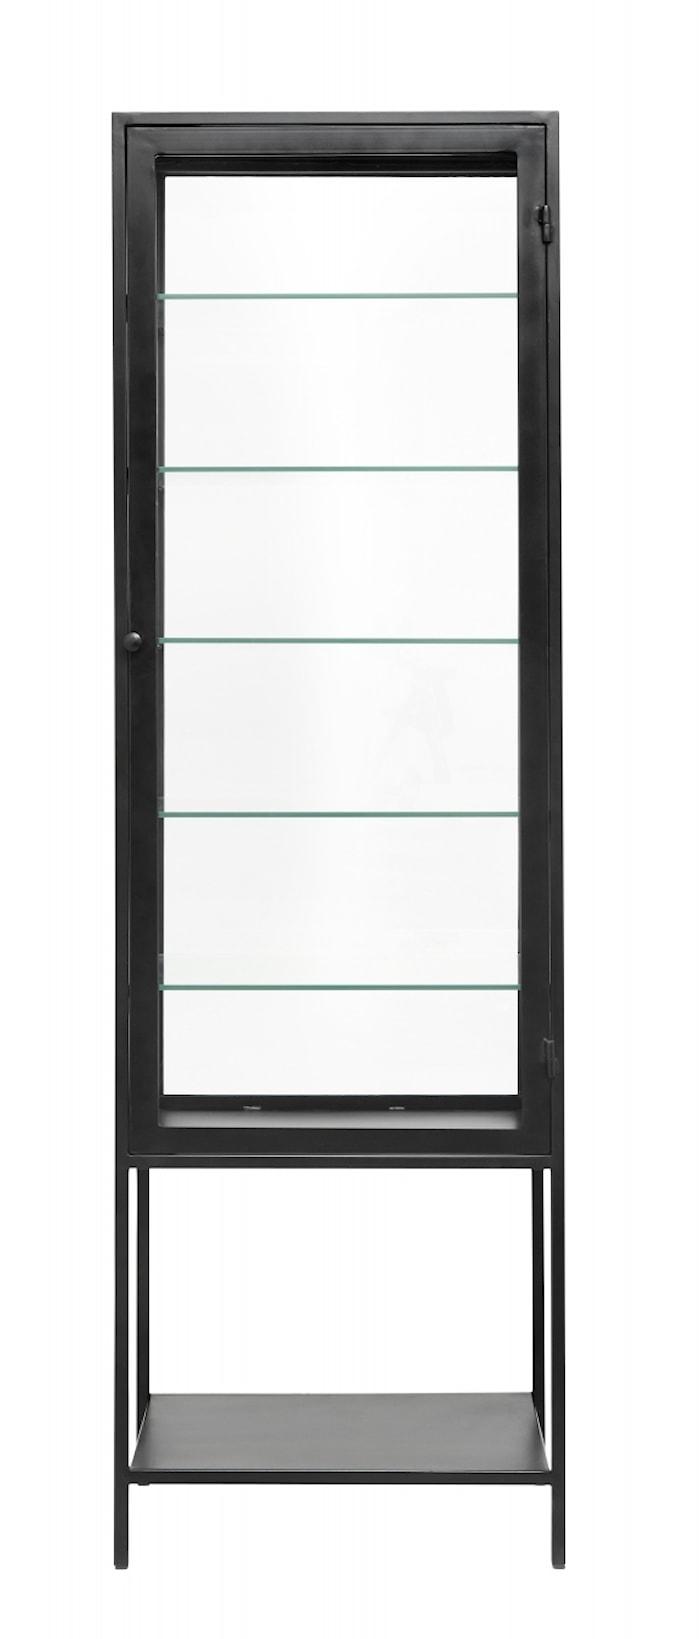 MONDO Vitrineskap Jern/Glass Svart 198x61cm